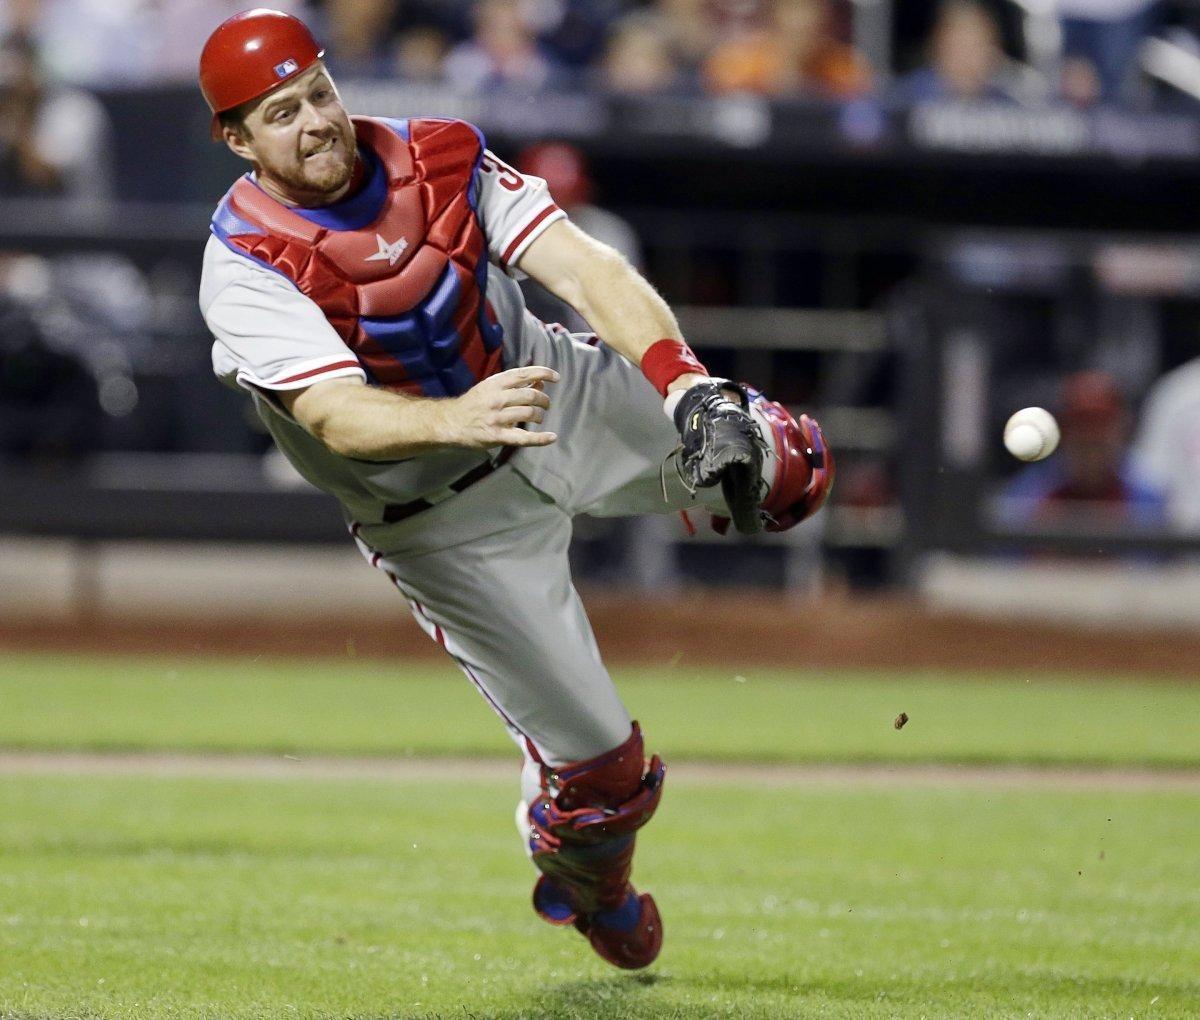 Yankees Acquire Minor League Catcher Erik Kratz From Indians Ahead Of Suspension Appeals Phillies Yankees League